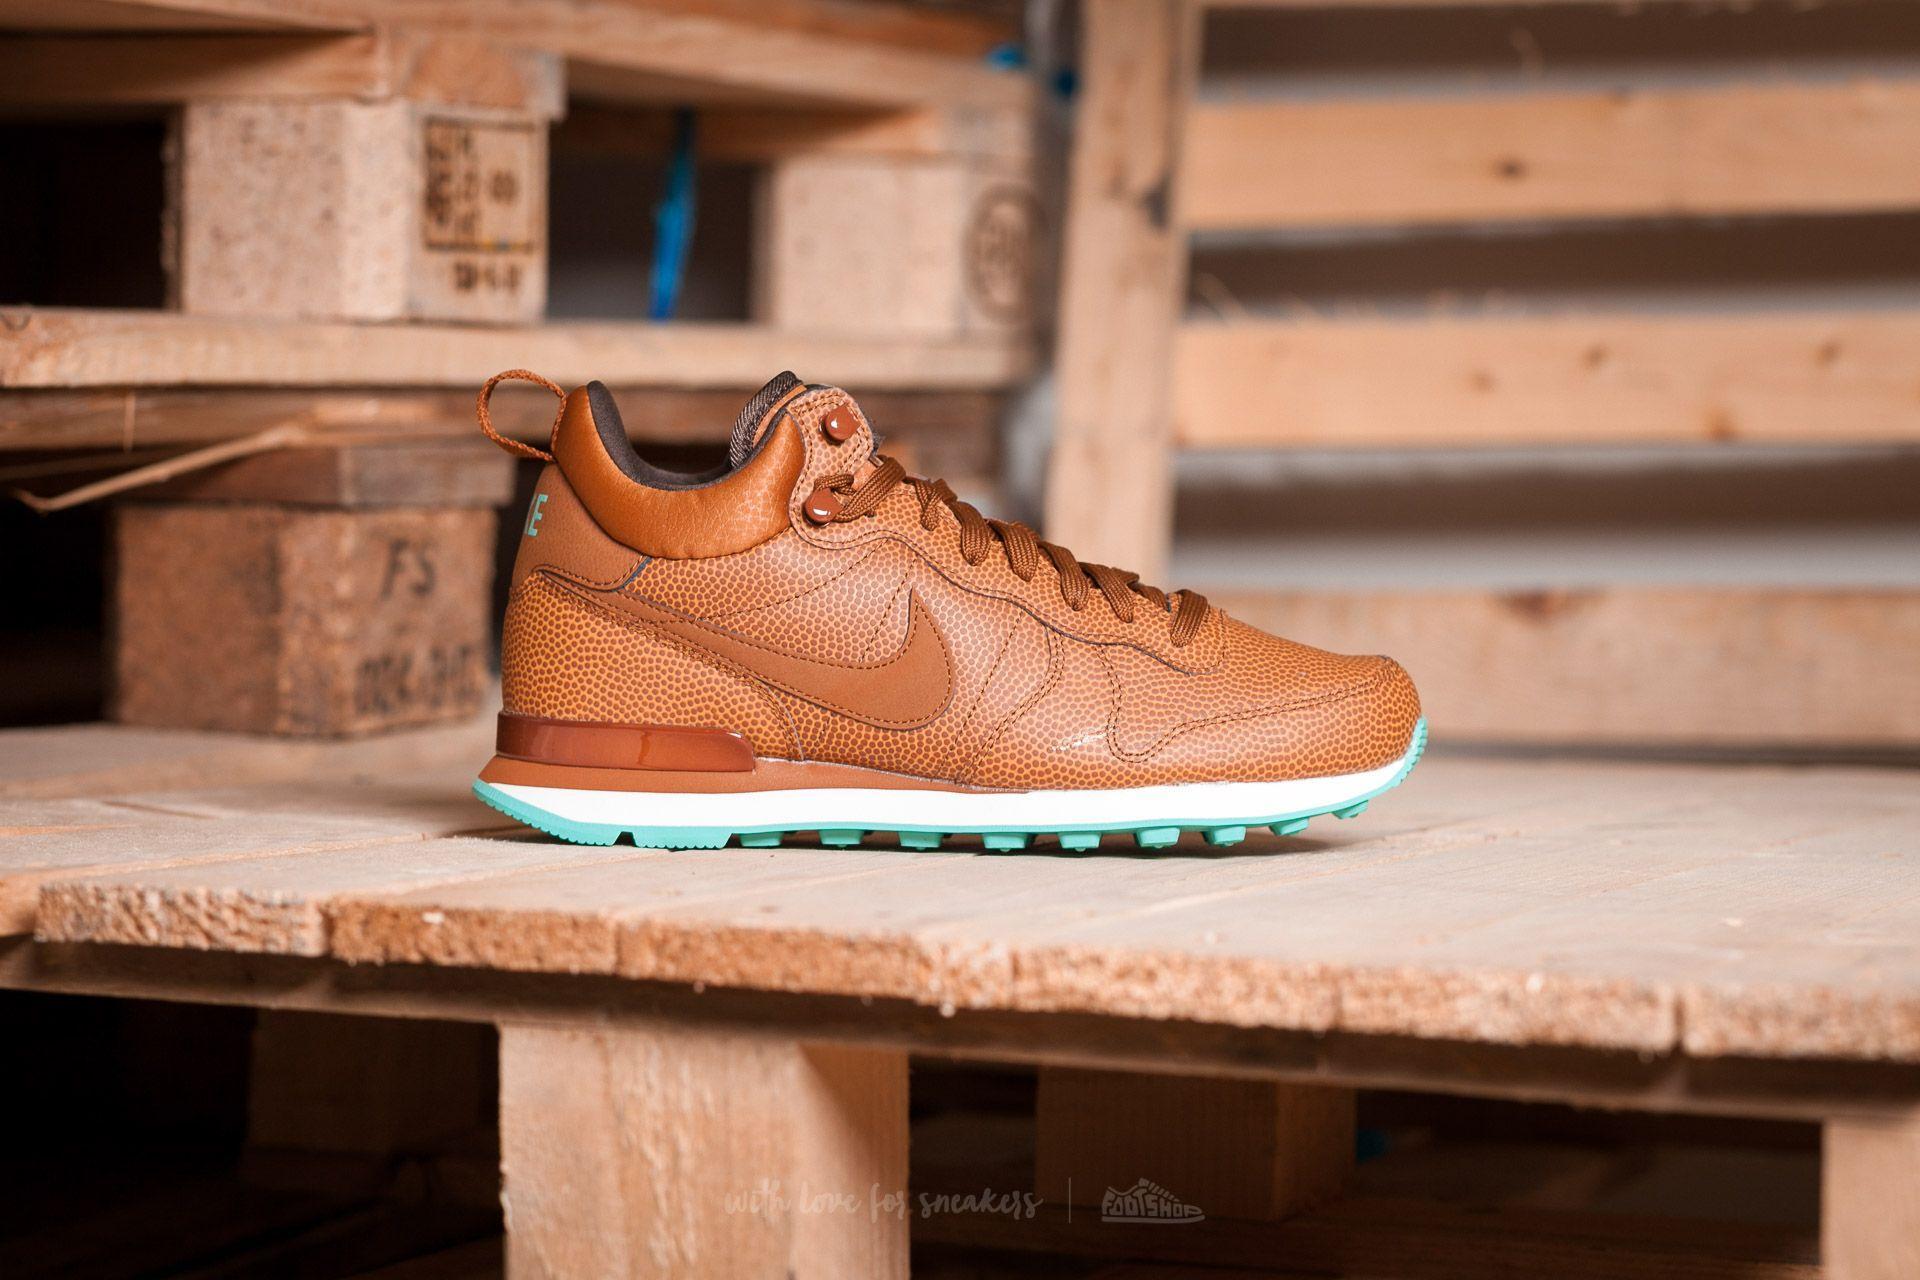 e35deb3553cf Lyst - Nike W Internationalist Mid Leather Hazelnut  Hazelnut-washed ...